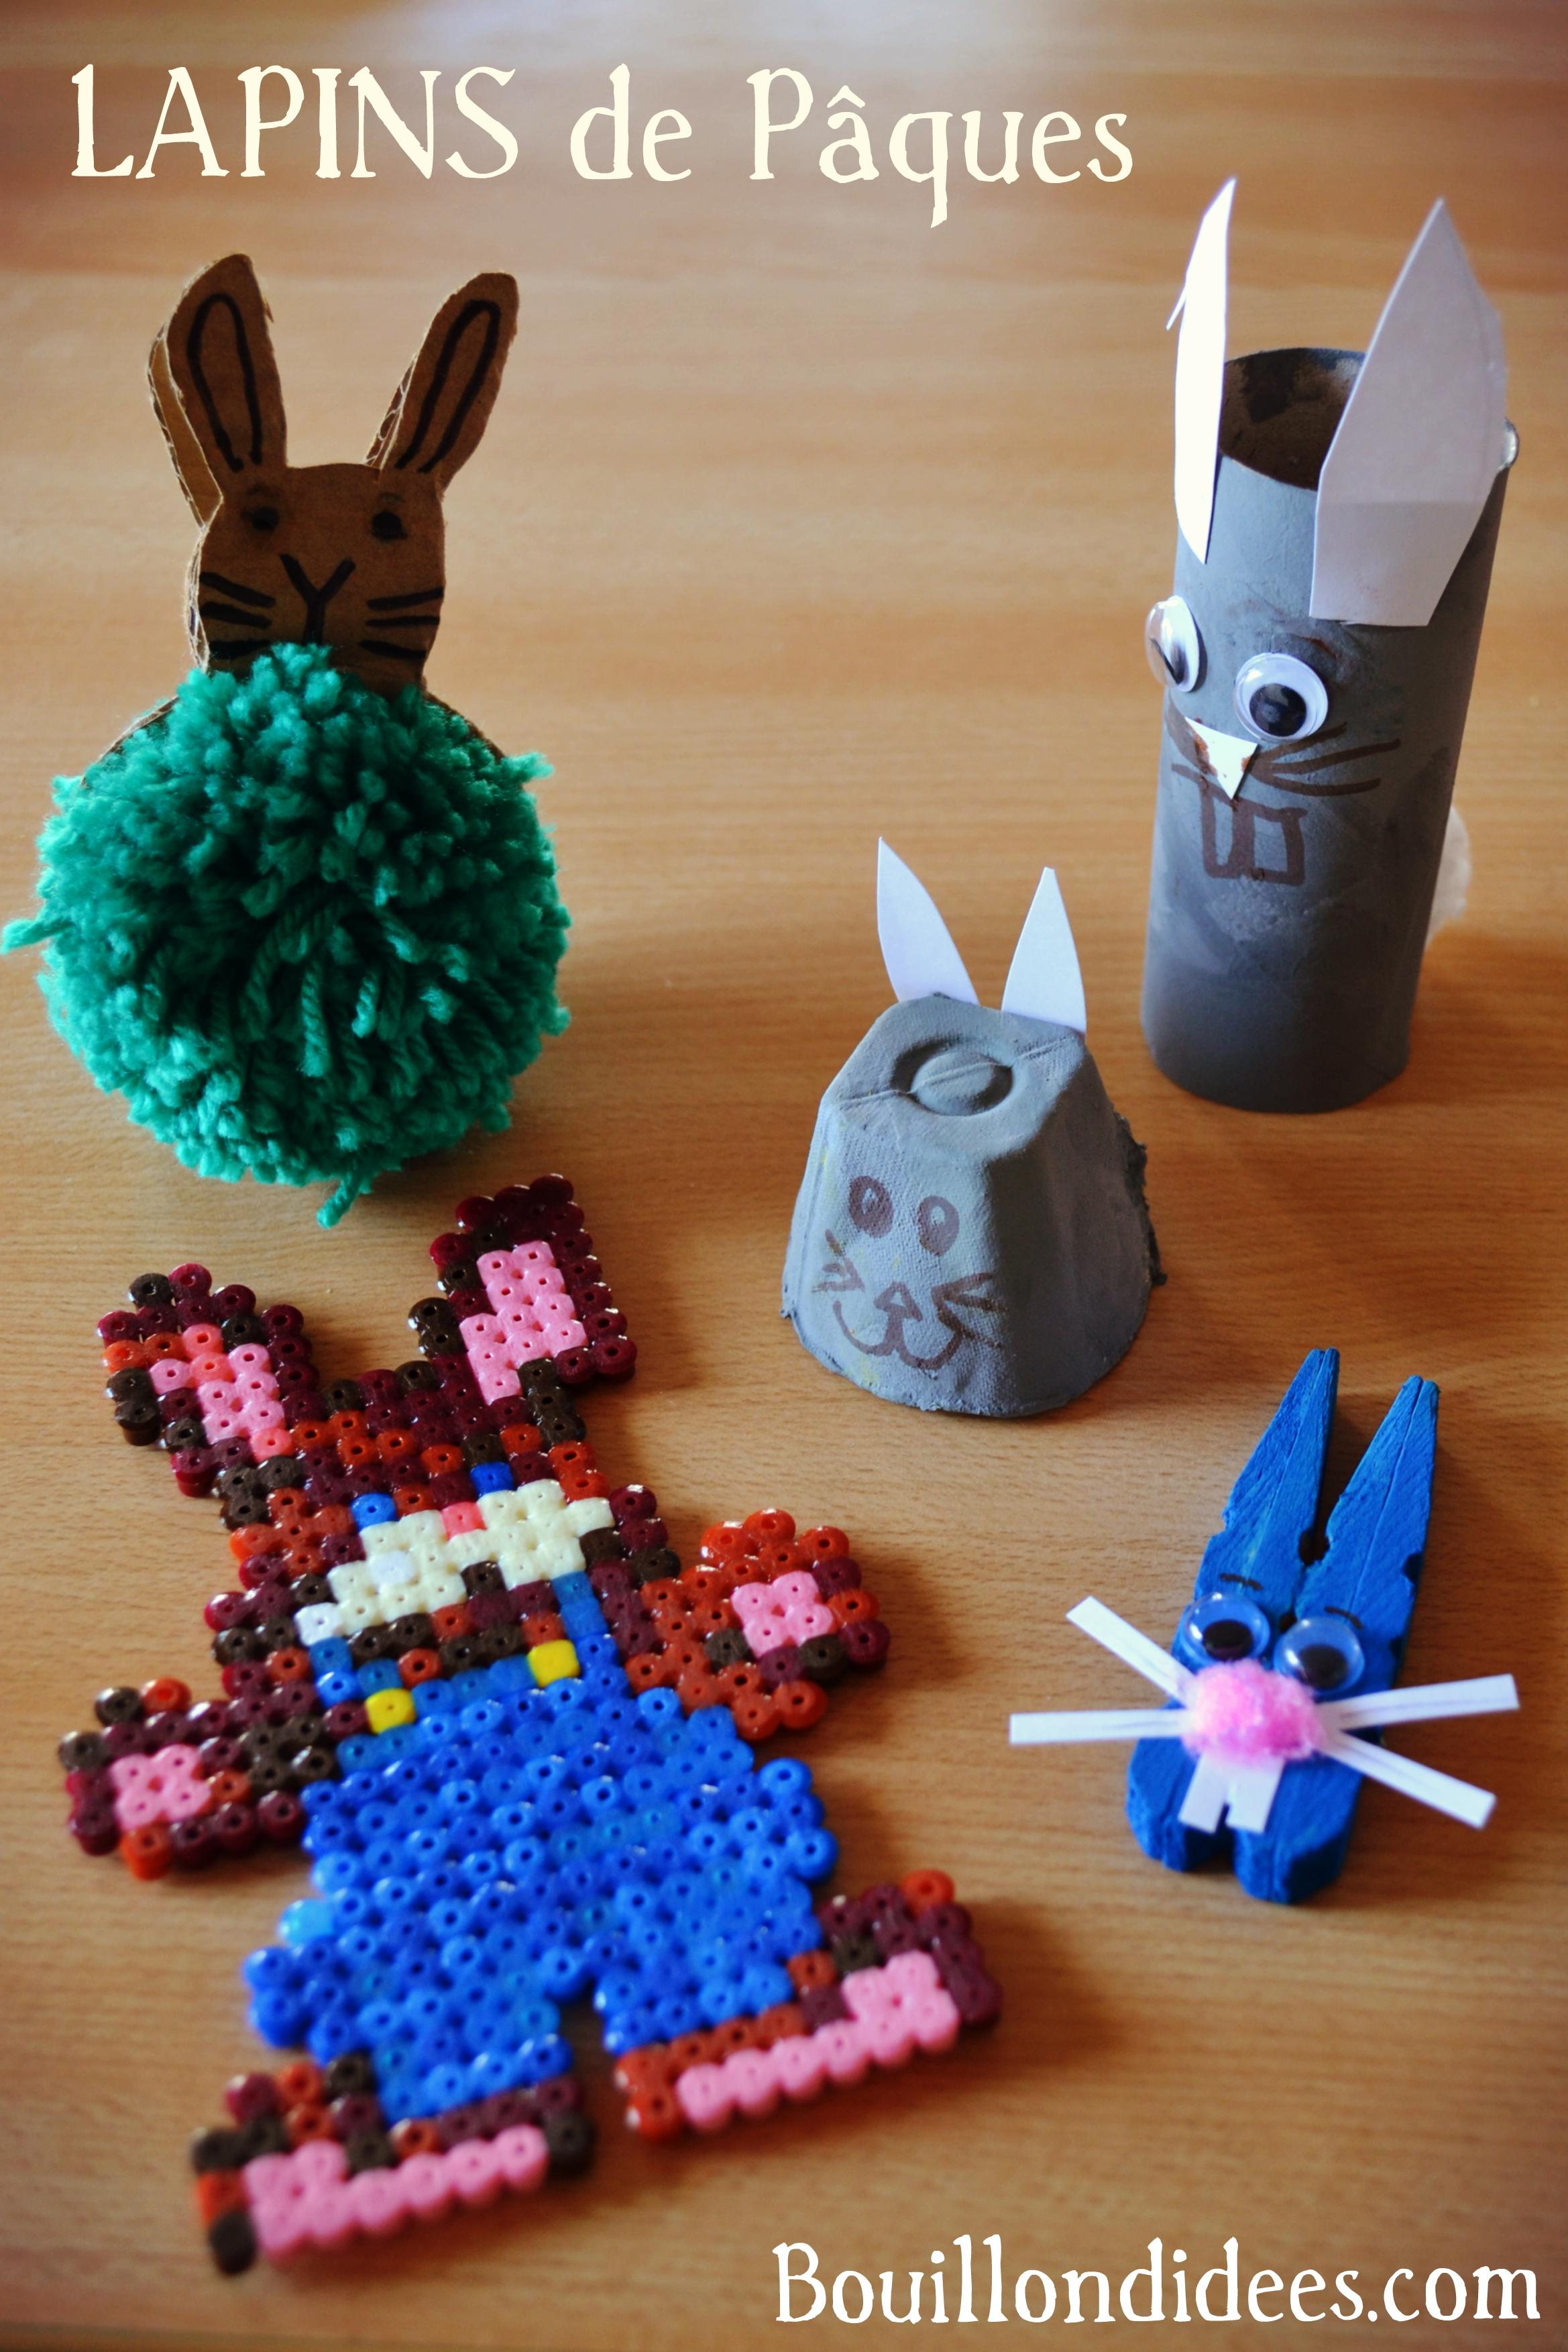 diy bricolage p ques lapins gogo. Black Bedroom Furniture Sets. Home Design Ideas